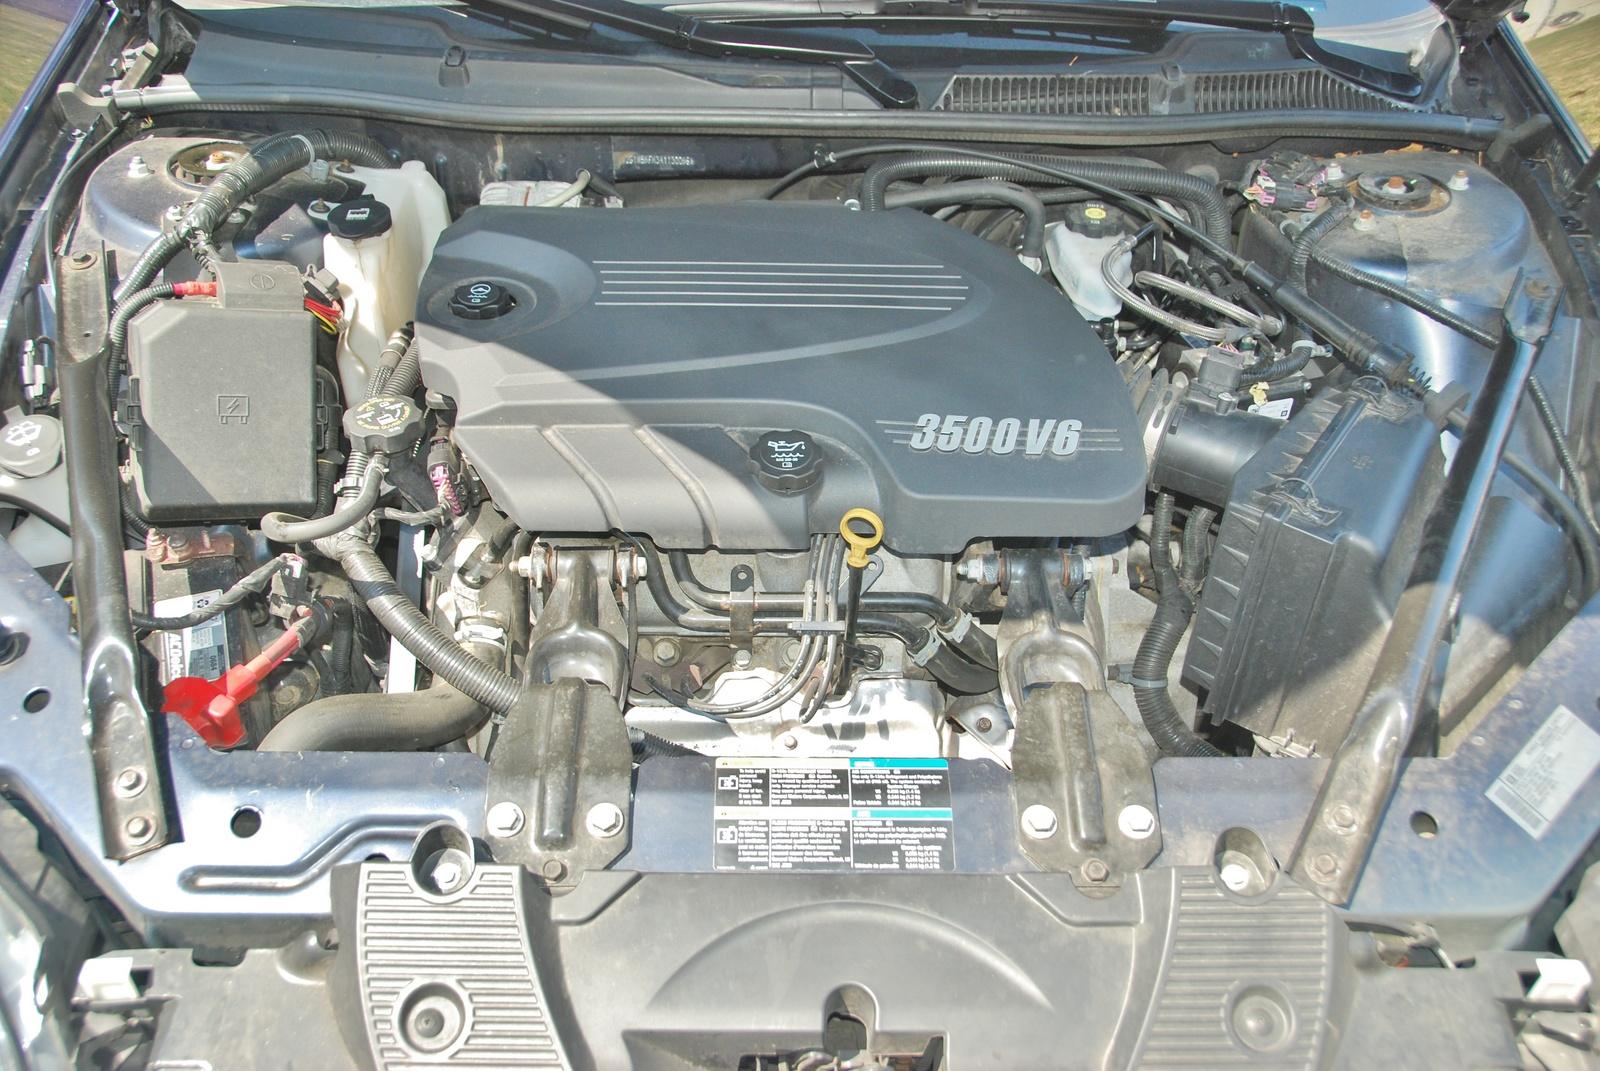 2002 chevy trailblazer ltz radio wiring diagram tecumseh compressor impala 3800 | get free image about